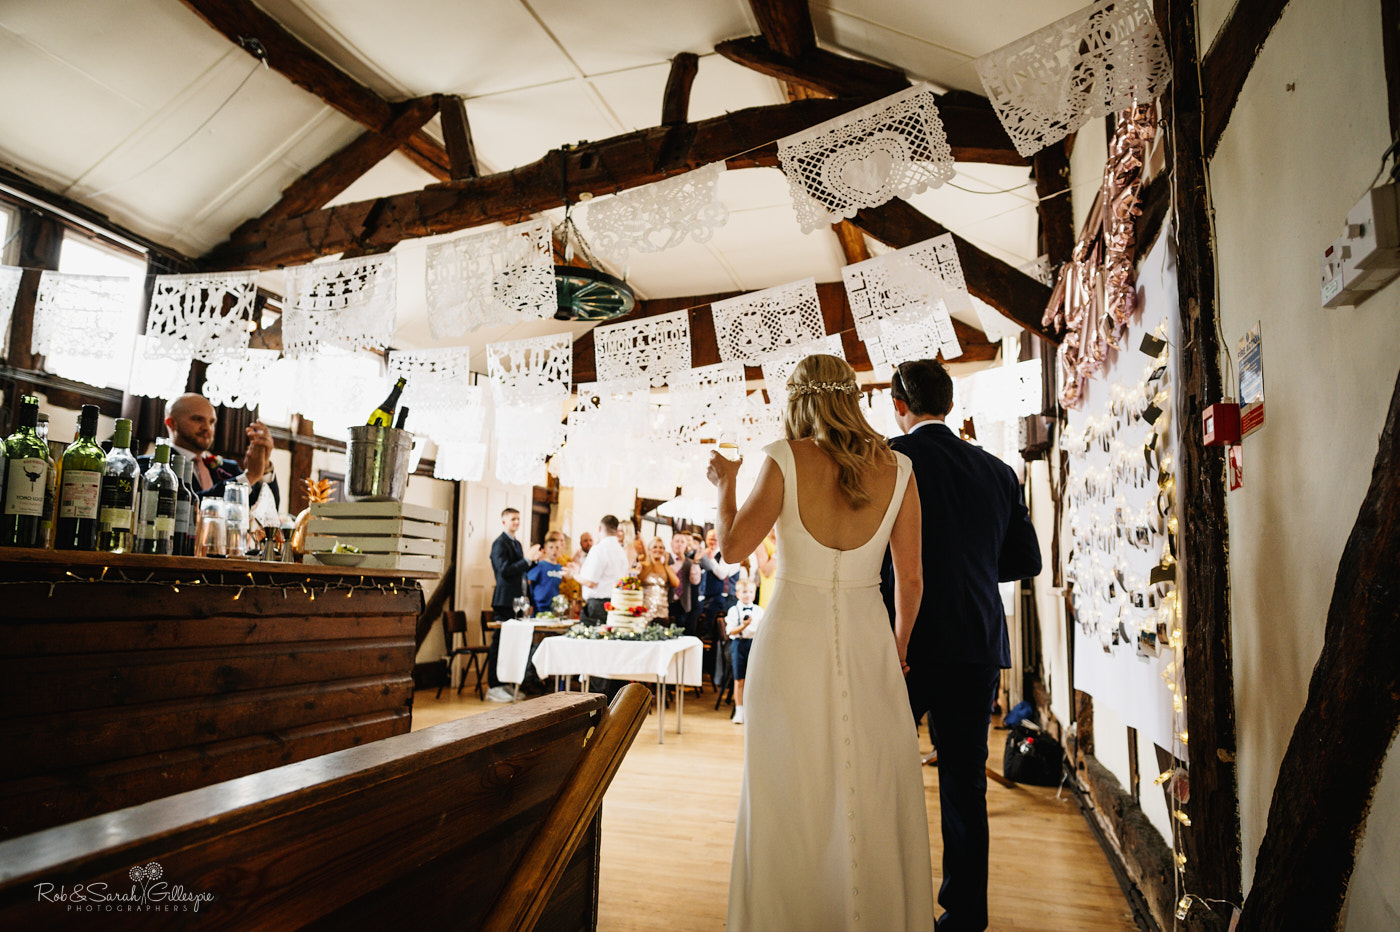 Belbroughton Church Hall wedding reception